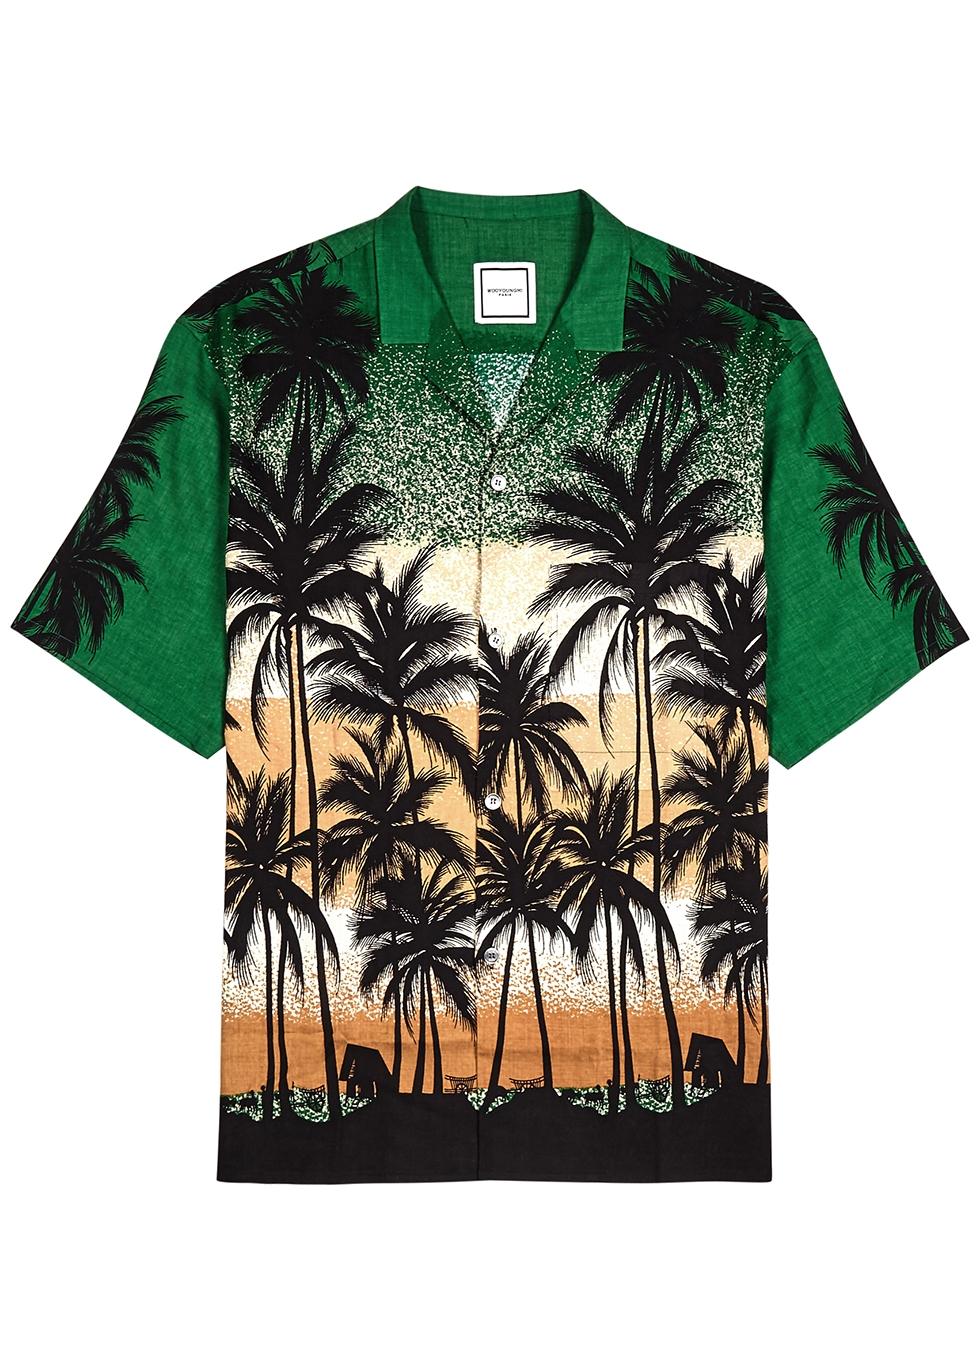 Green printed woven shirt